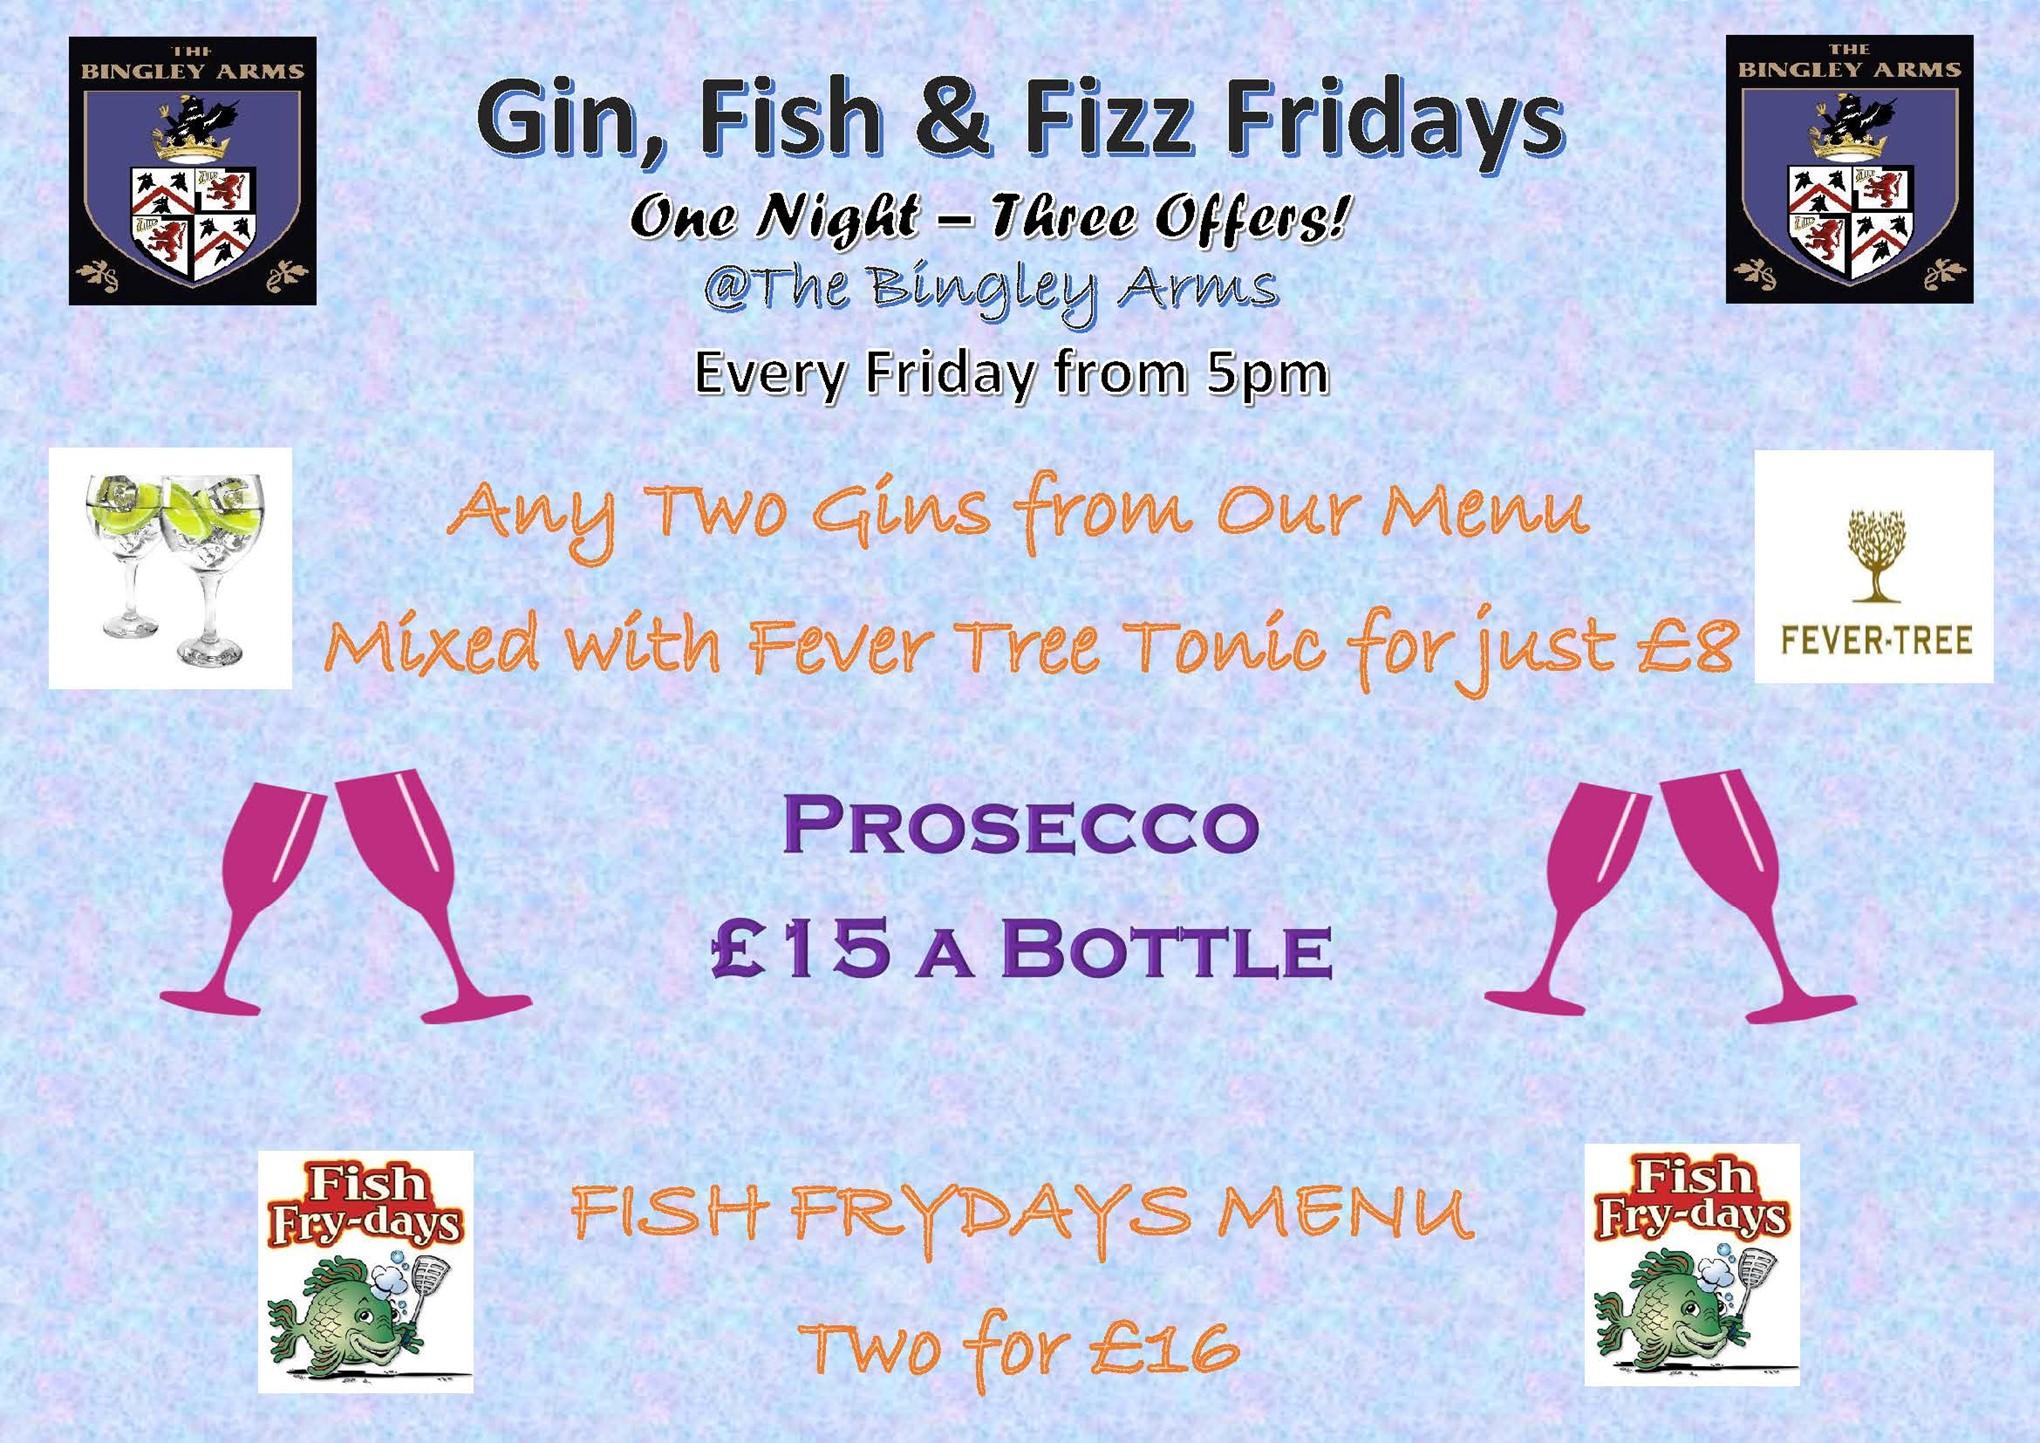 Gin, Fizz & Fish Frydays!